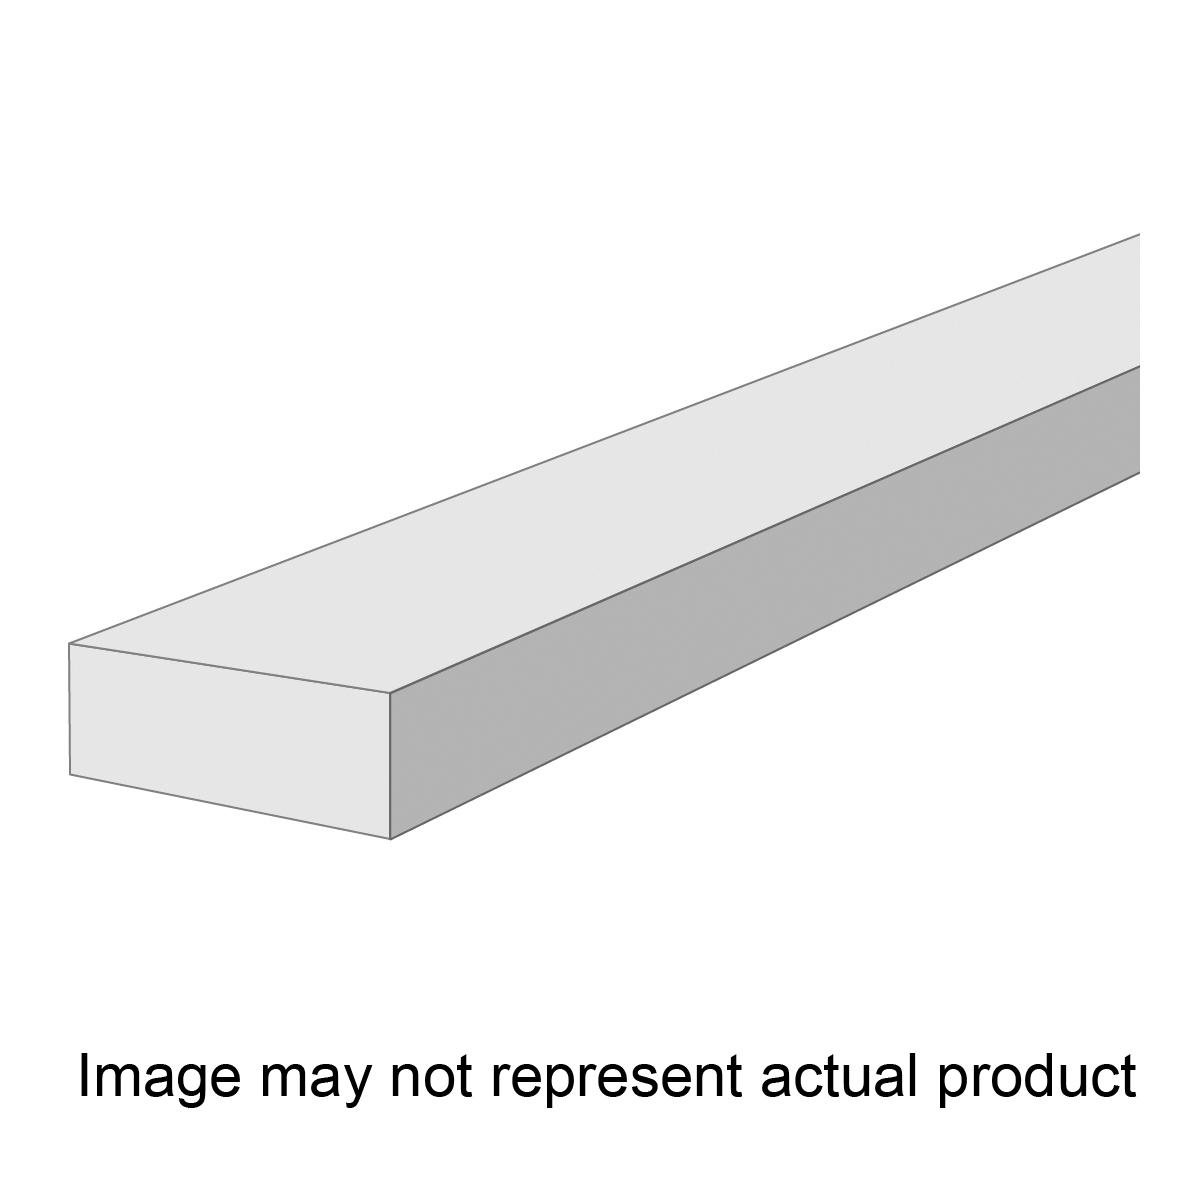 x 6 in 2 in Construction Douglas Fir Board Stud Wood Lumber Custom Length 1ft